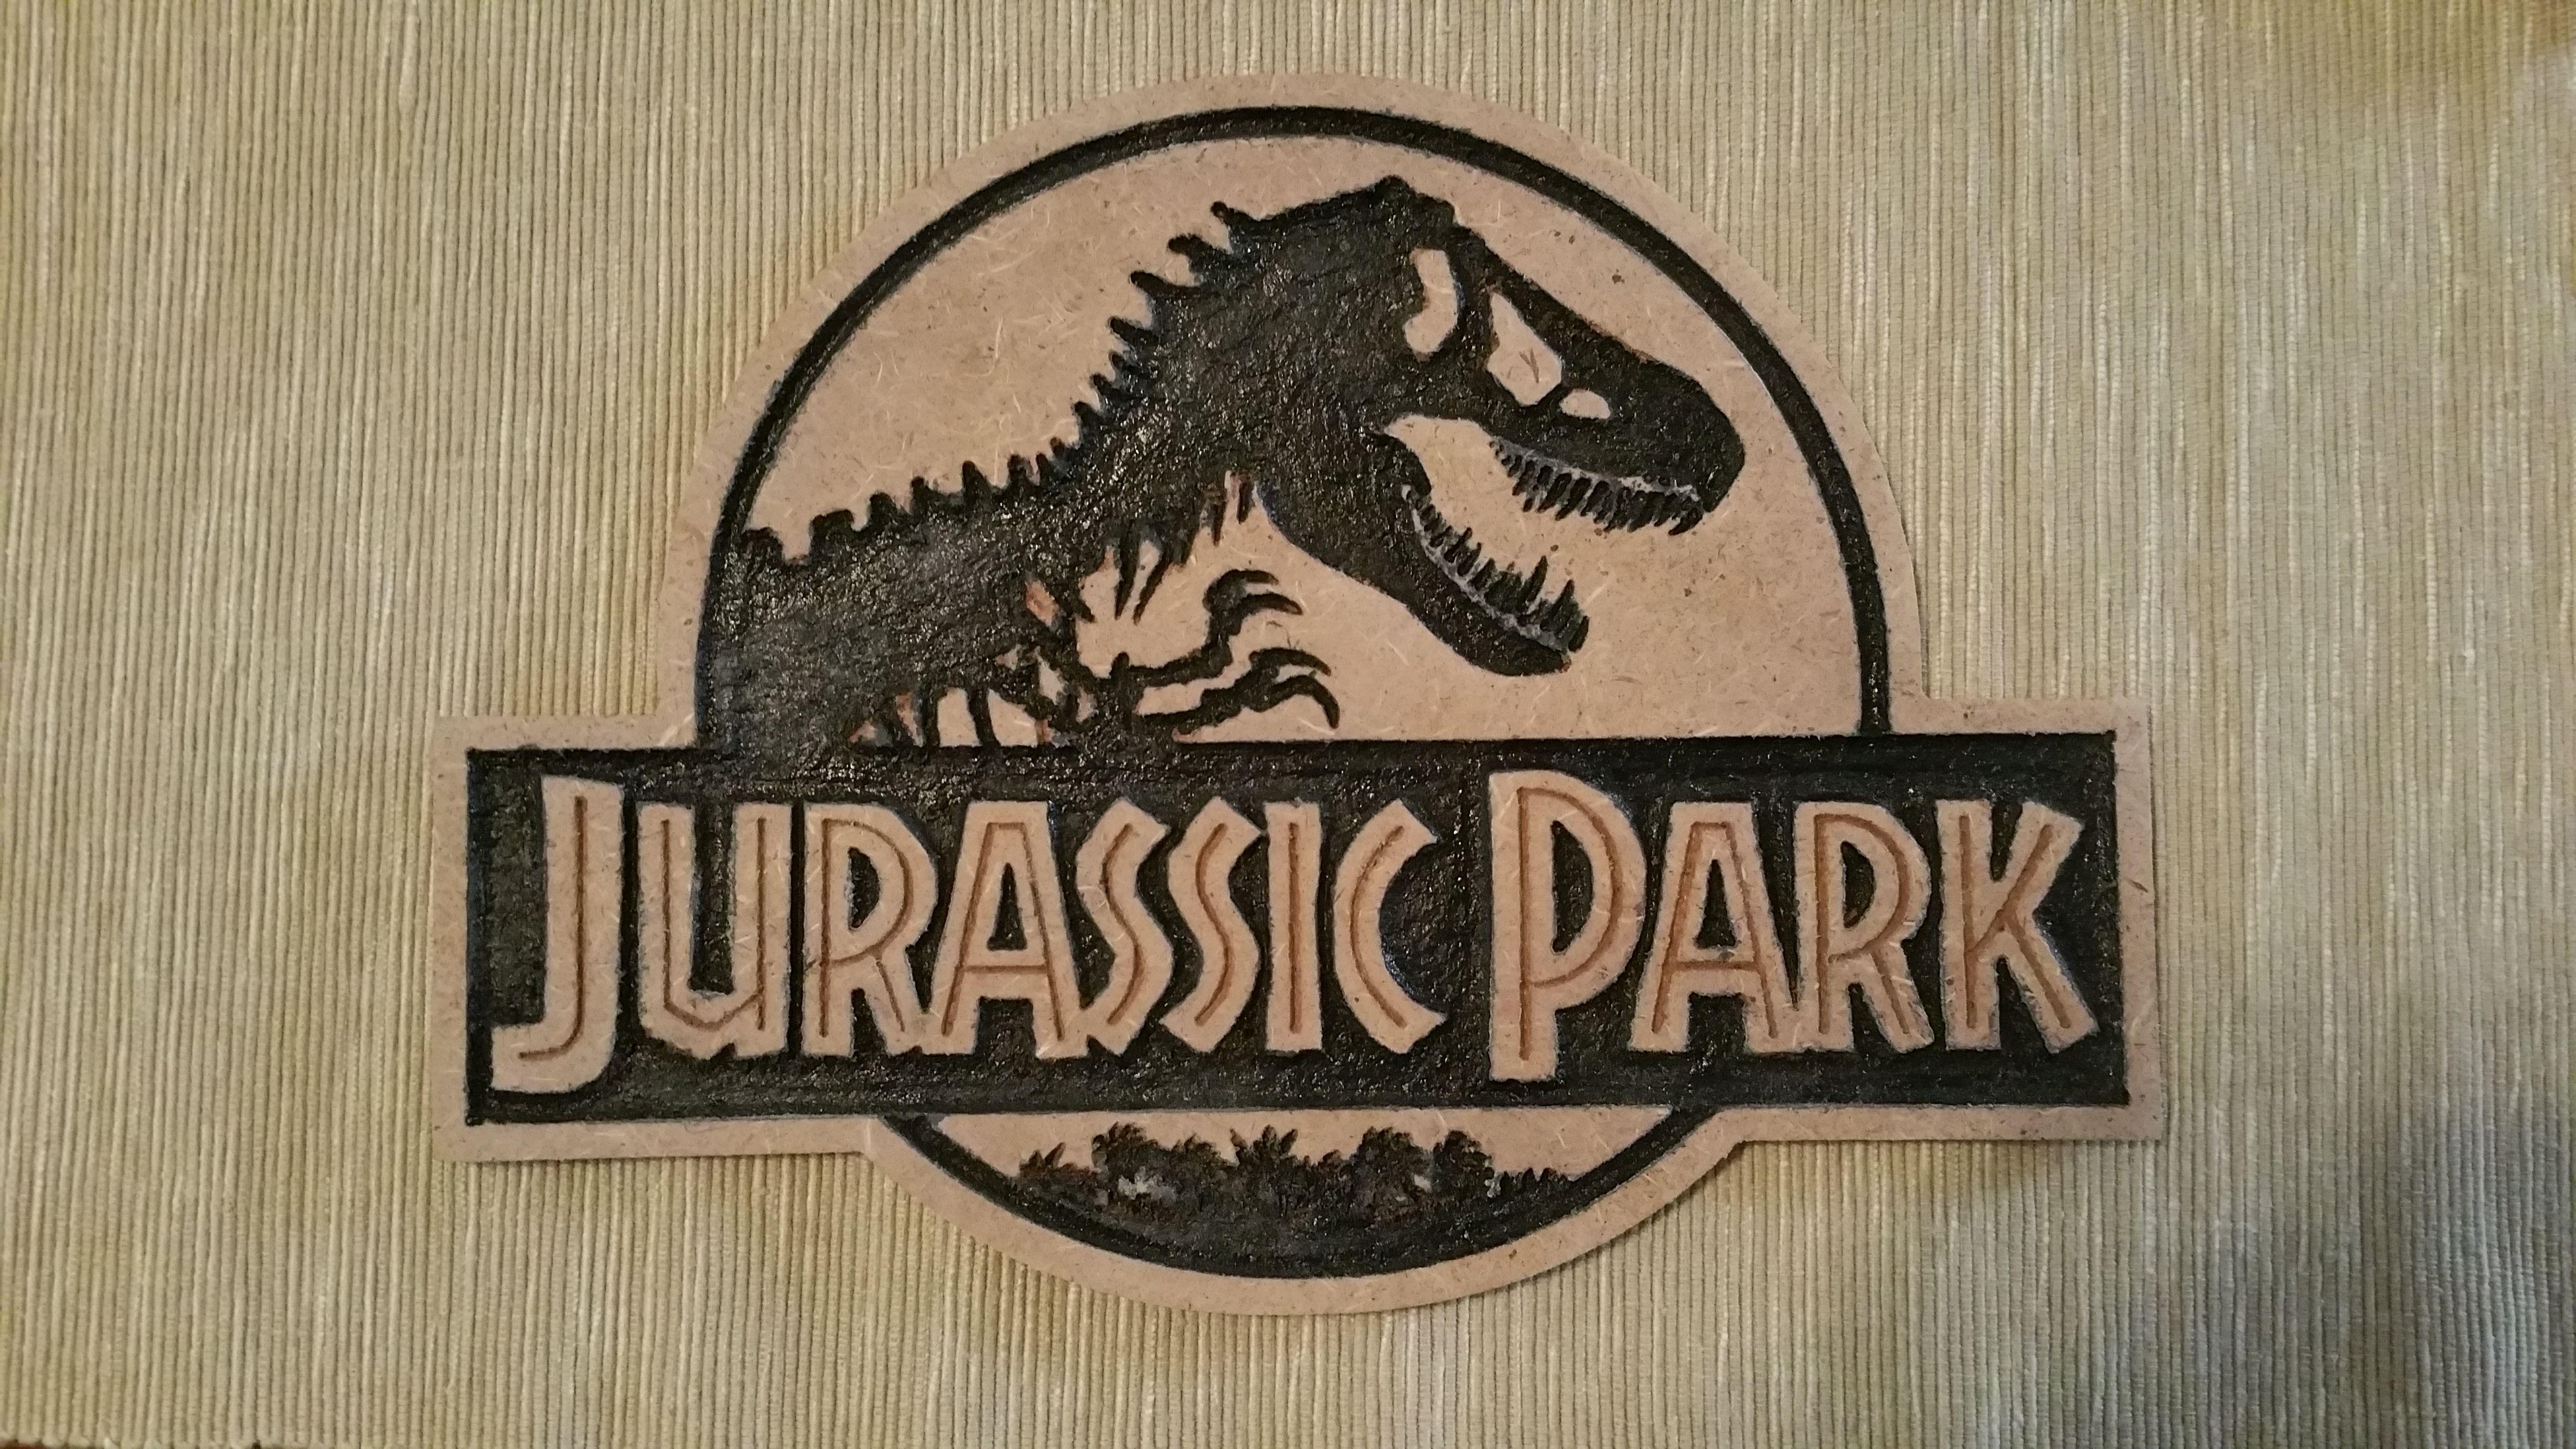 My own mini Jurassic Park! | Decor, Jurassic park, Home decor  |Jurassic Park Interior Design